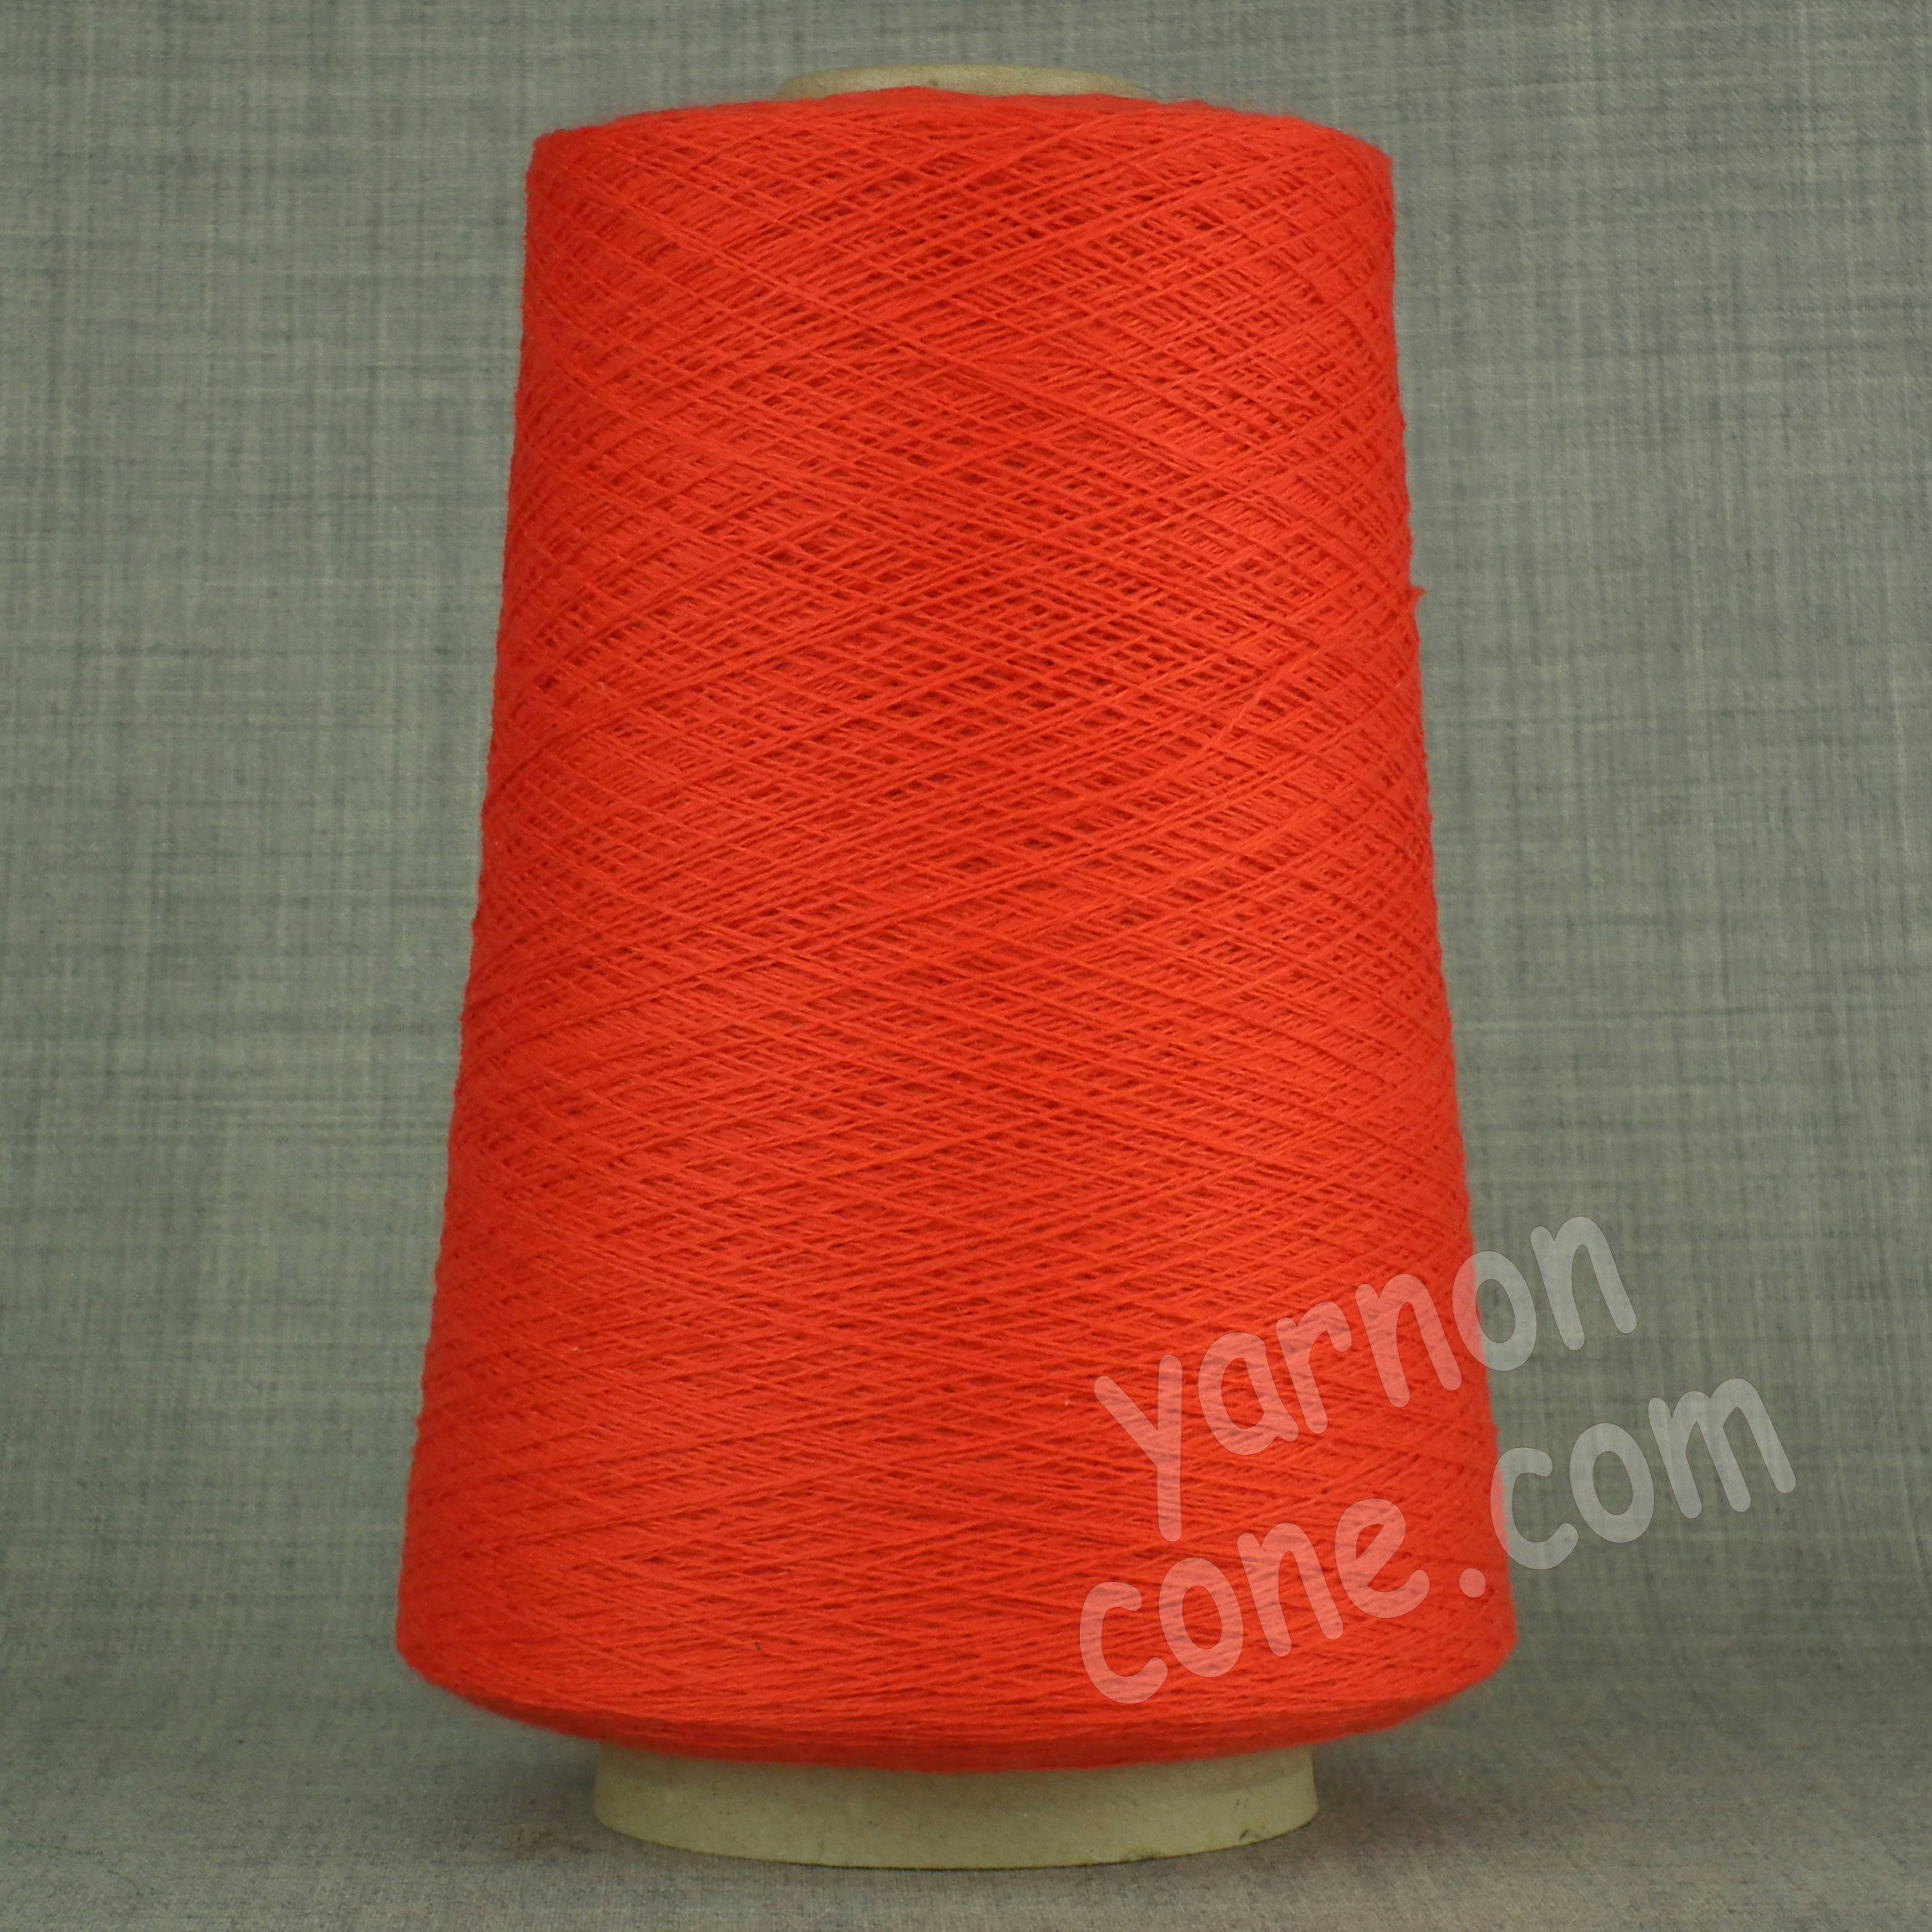 cashmere cotton todd duncan odyssey cone uk knitting soft yarn orange